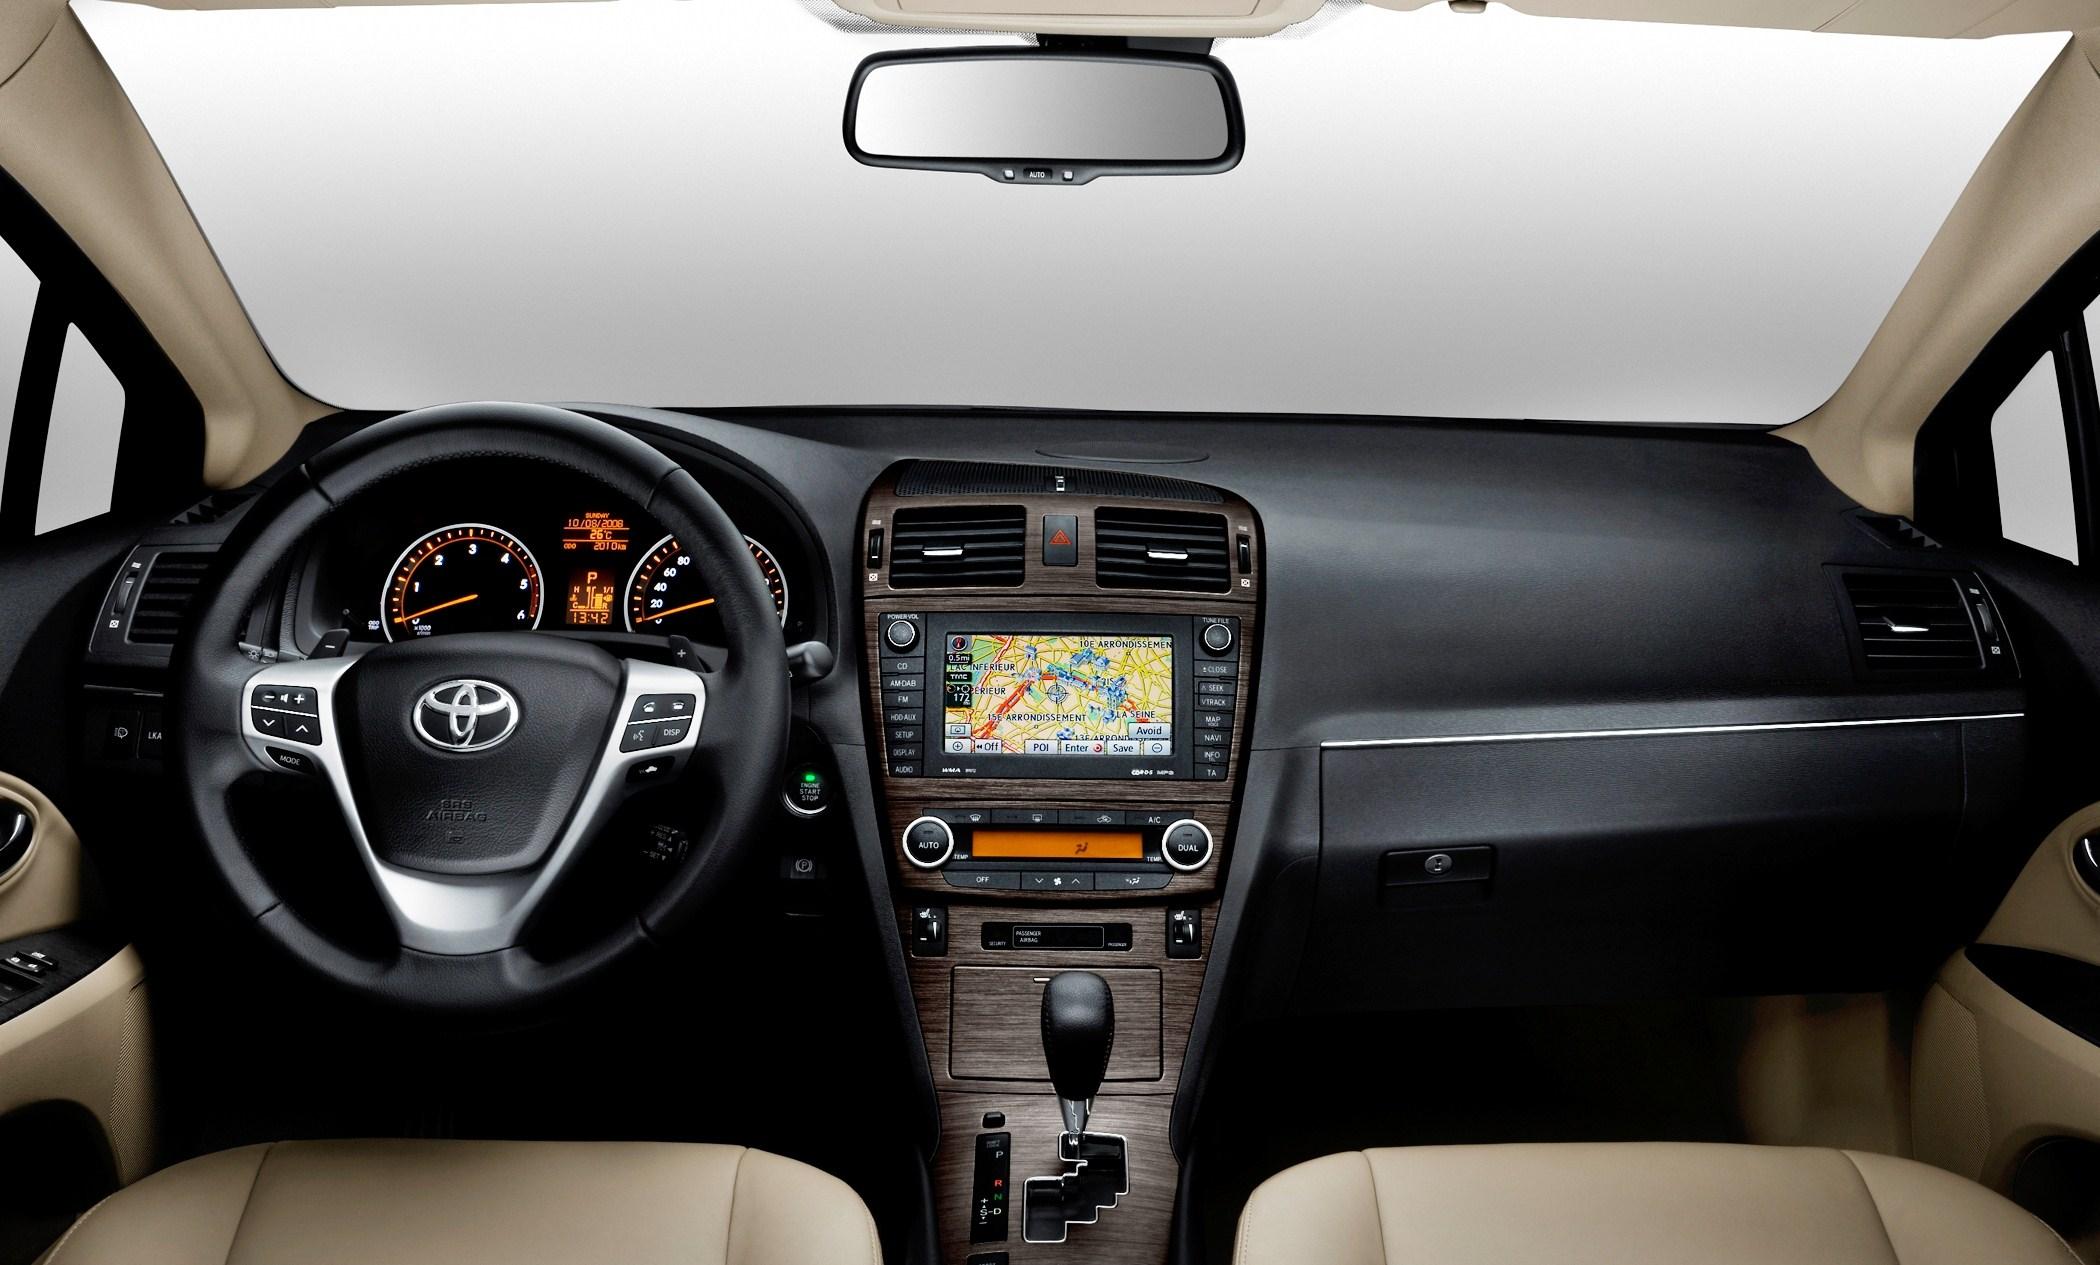 2009 Toyota Avensis Urban Cruiser and iQ